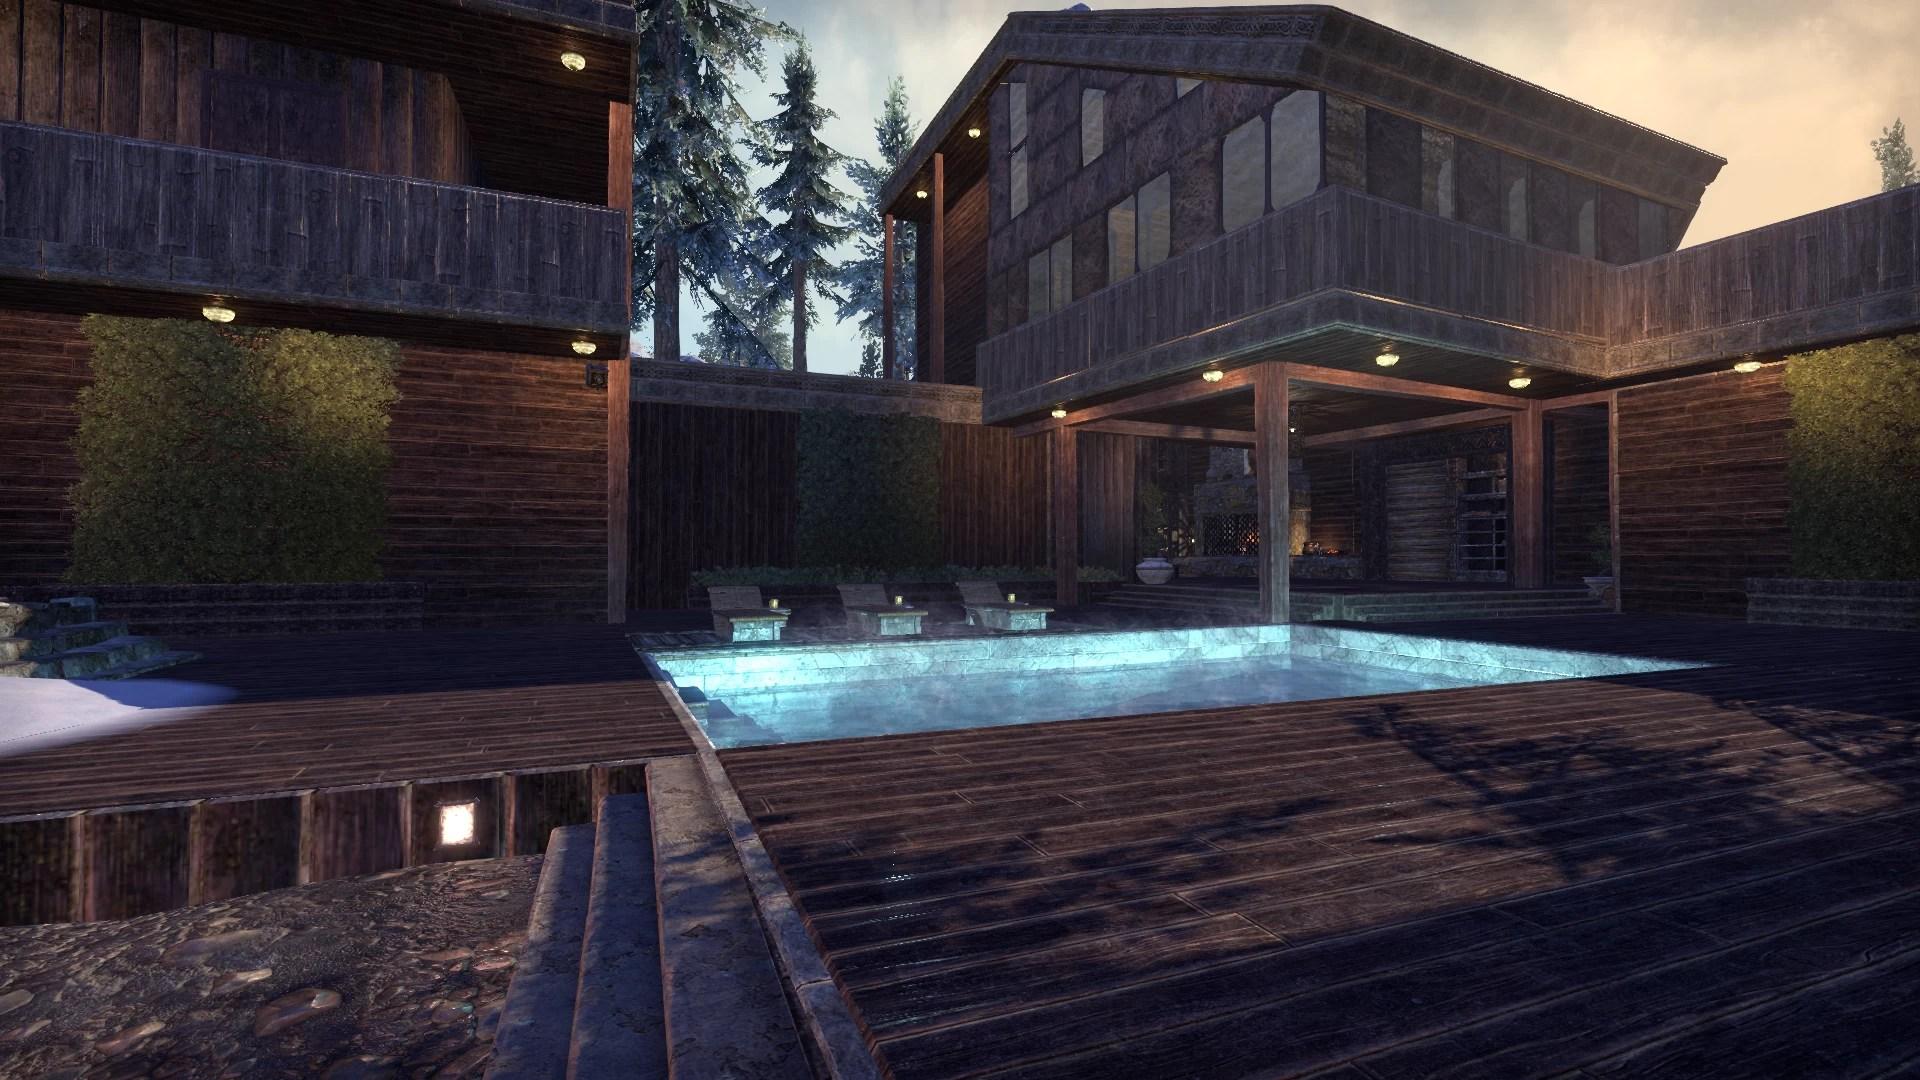 Winter house in Markarth ESO HOUSING [EU]